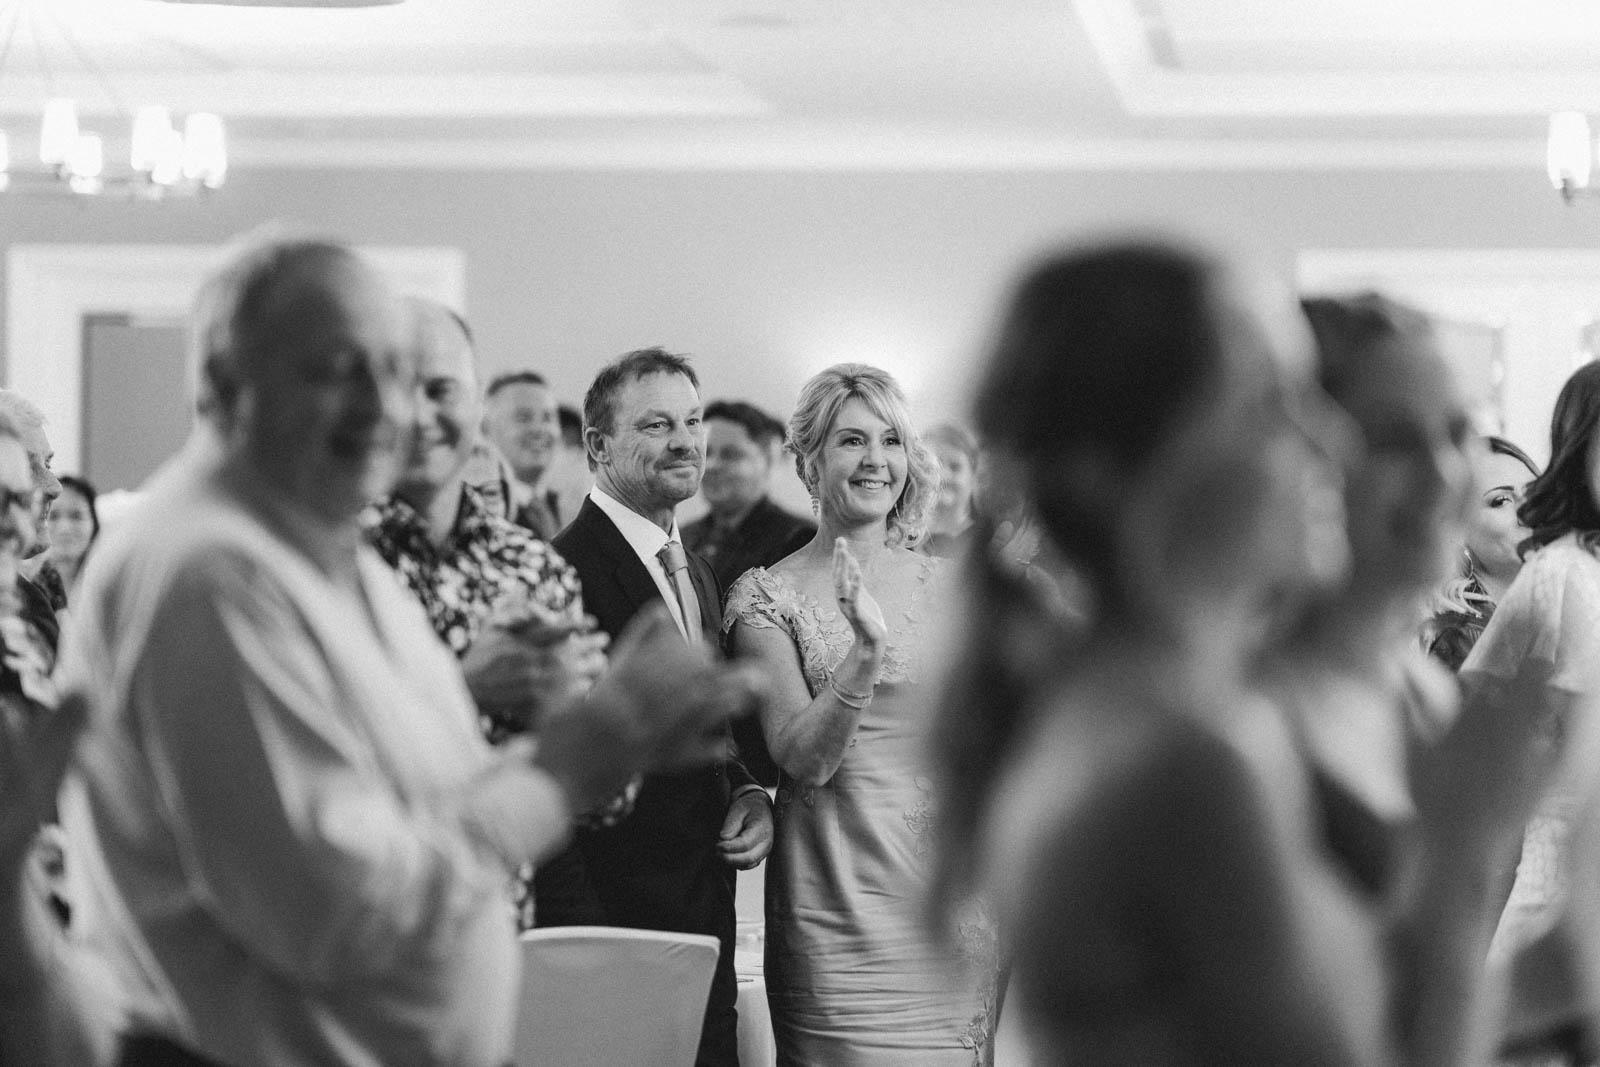 newfound-k-s-hilton-taupo-wedding-photographer-104